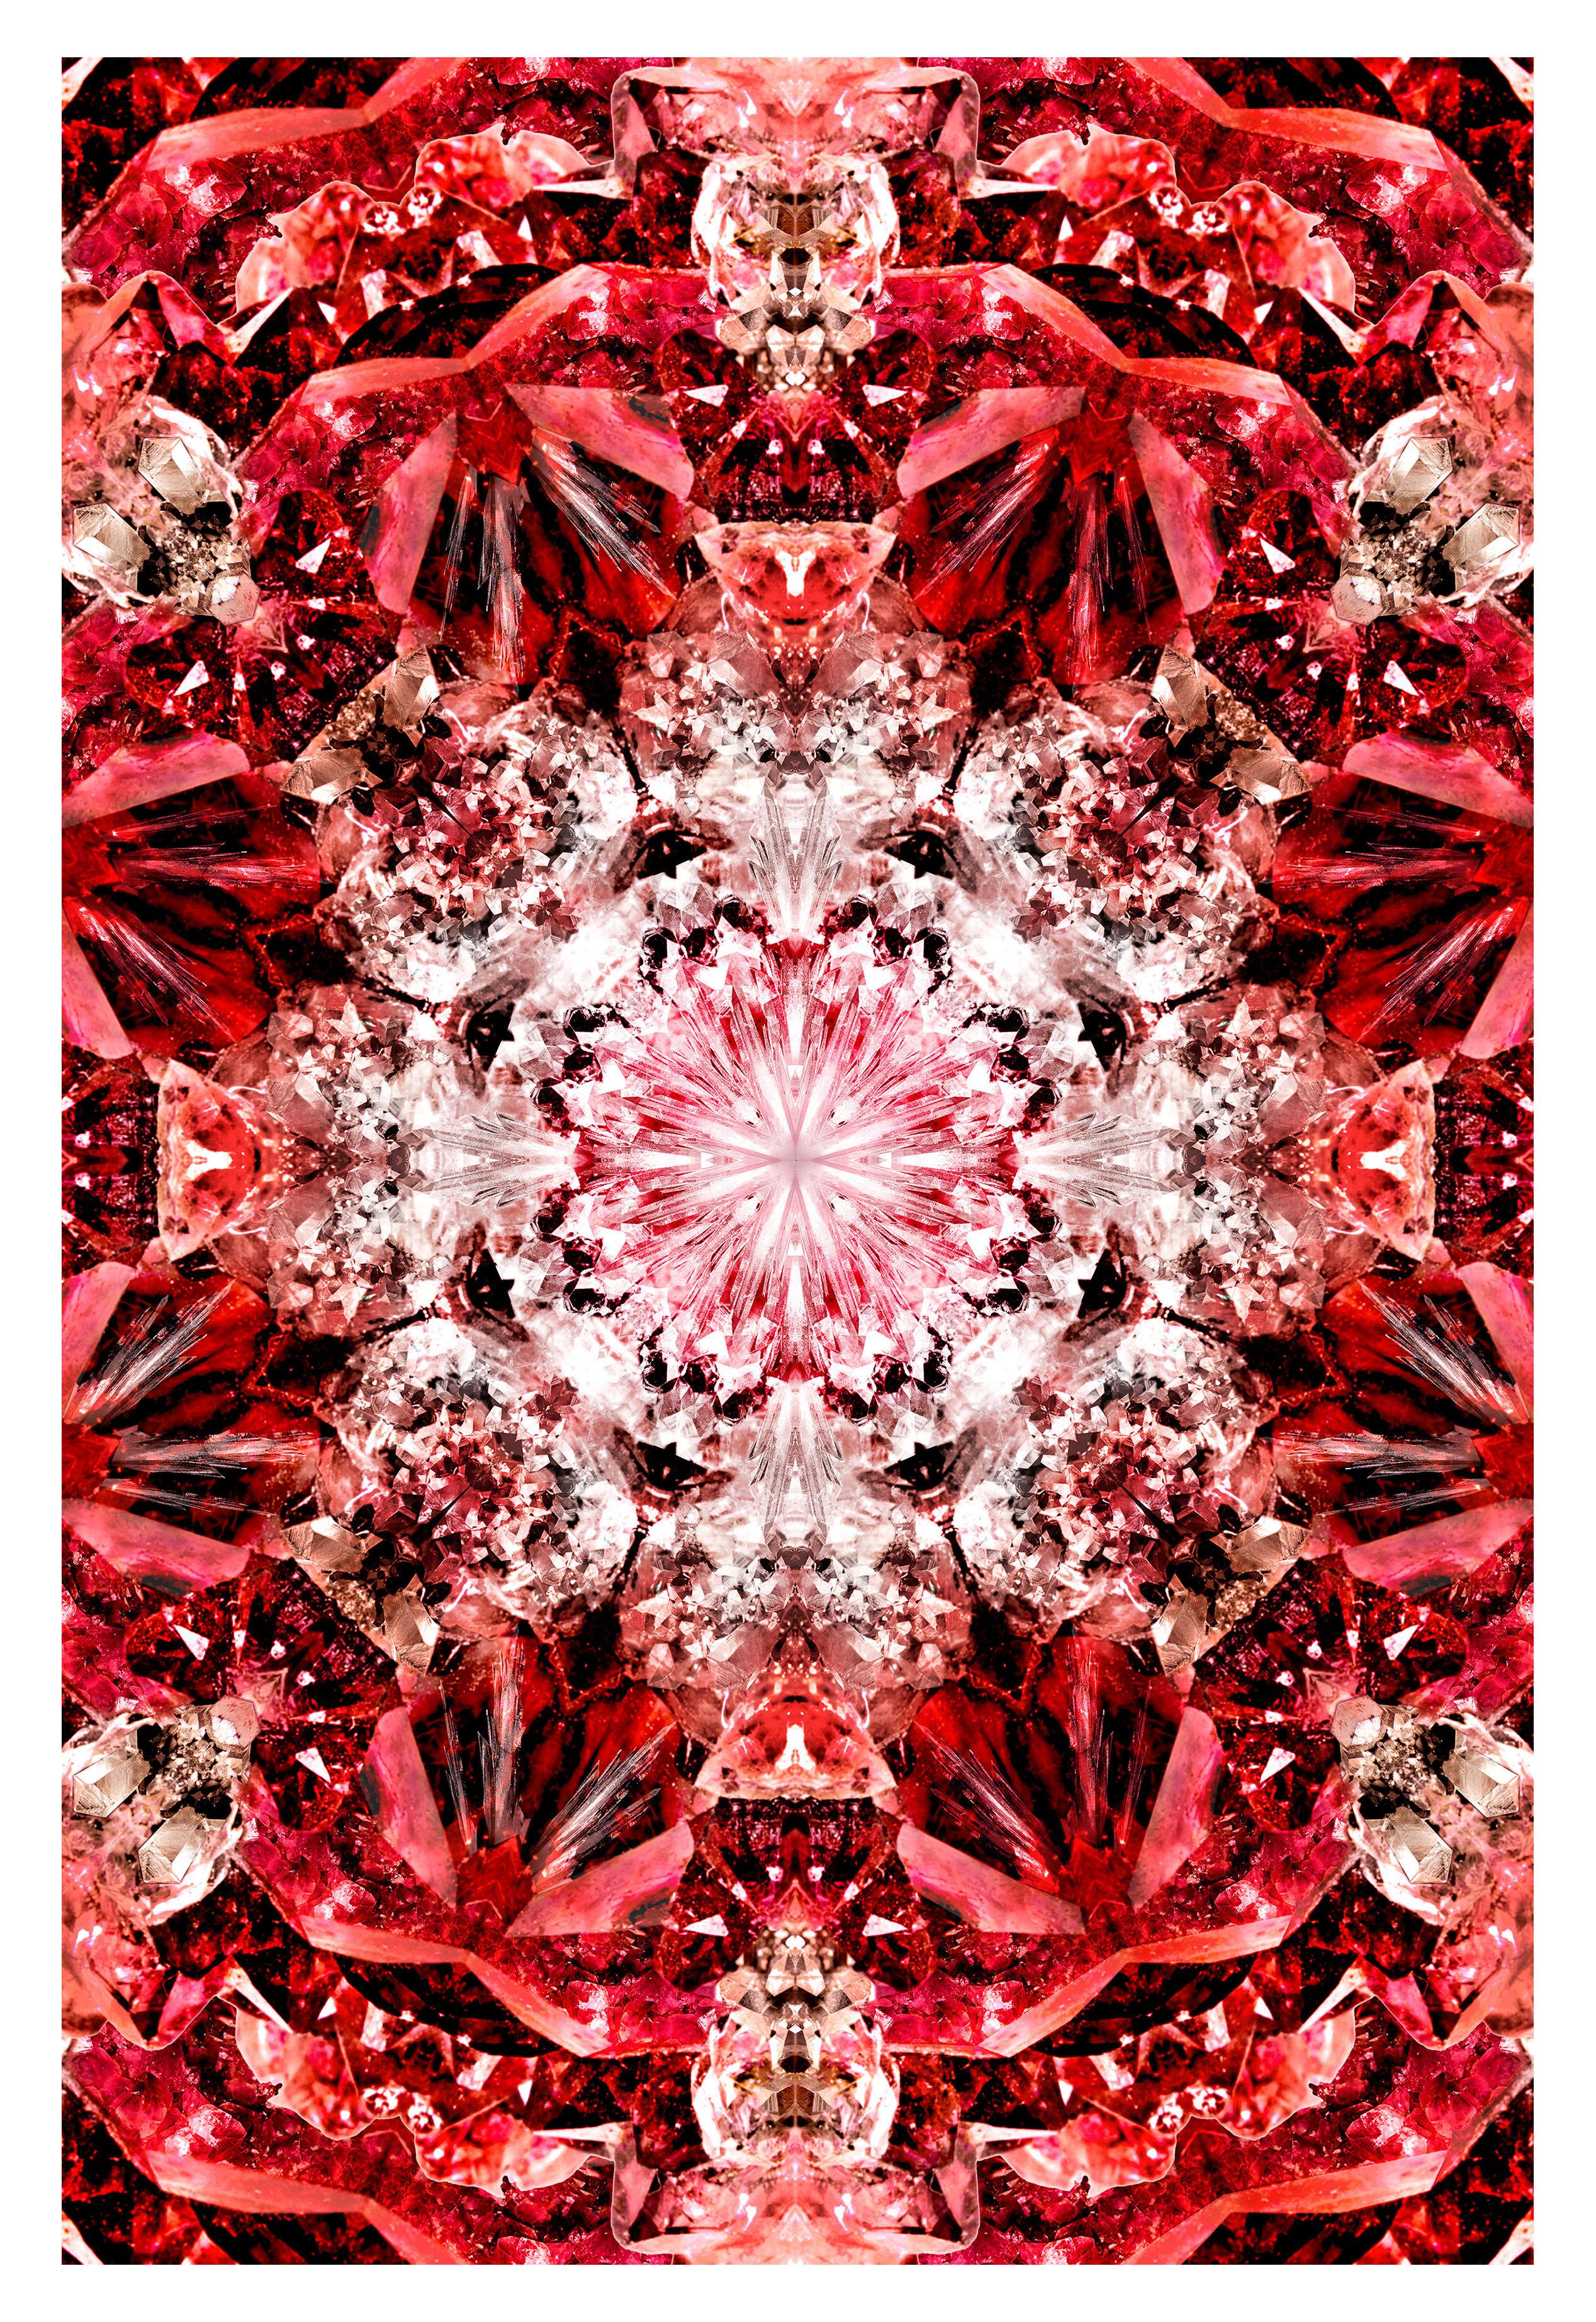 Dekoration - Teppiche - Crystal Fire Teppich / 300 x 200 cm - Moooi Carpets - Rottöne - Polyamid